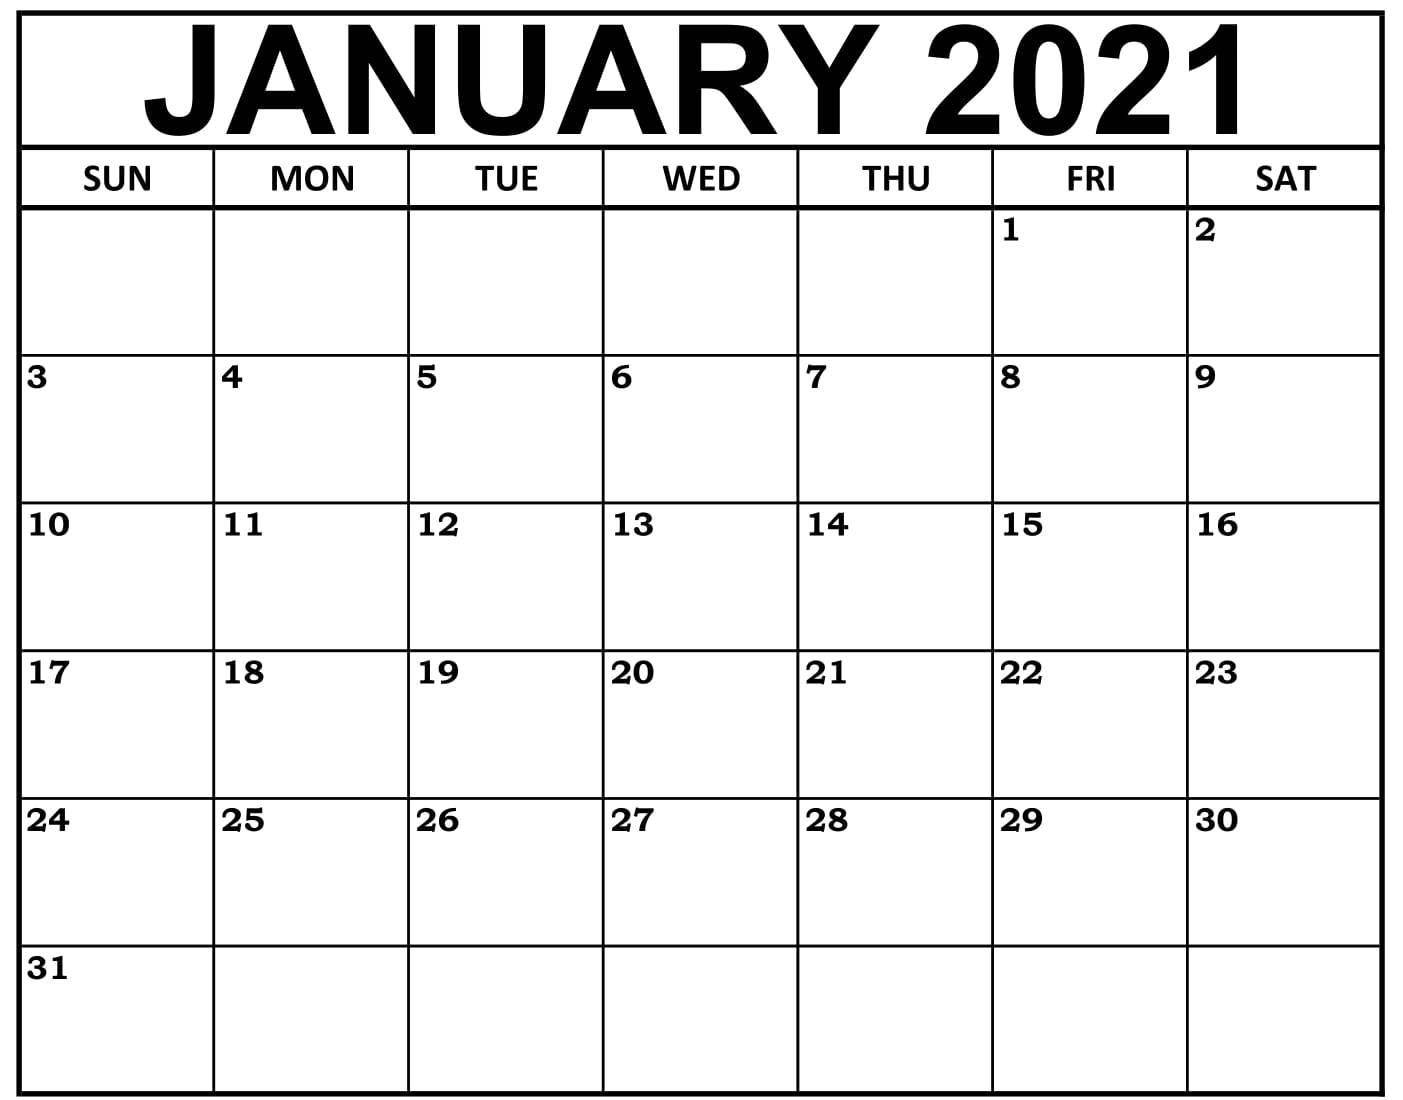 Canadian Holidays 2021 Calendar